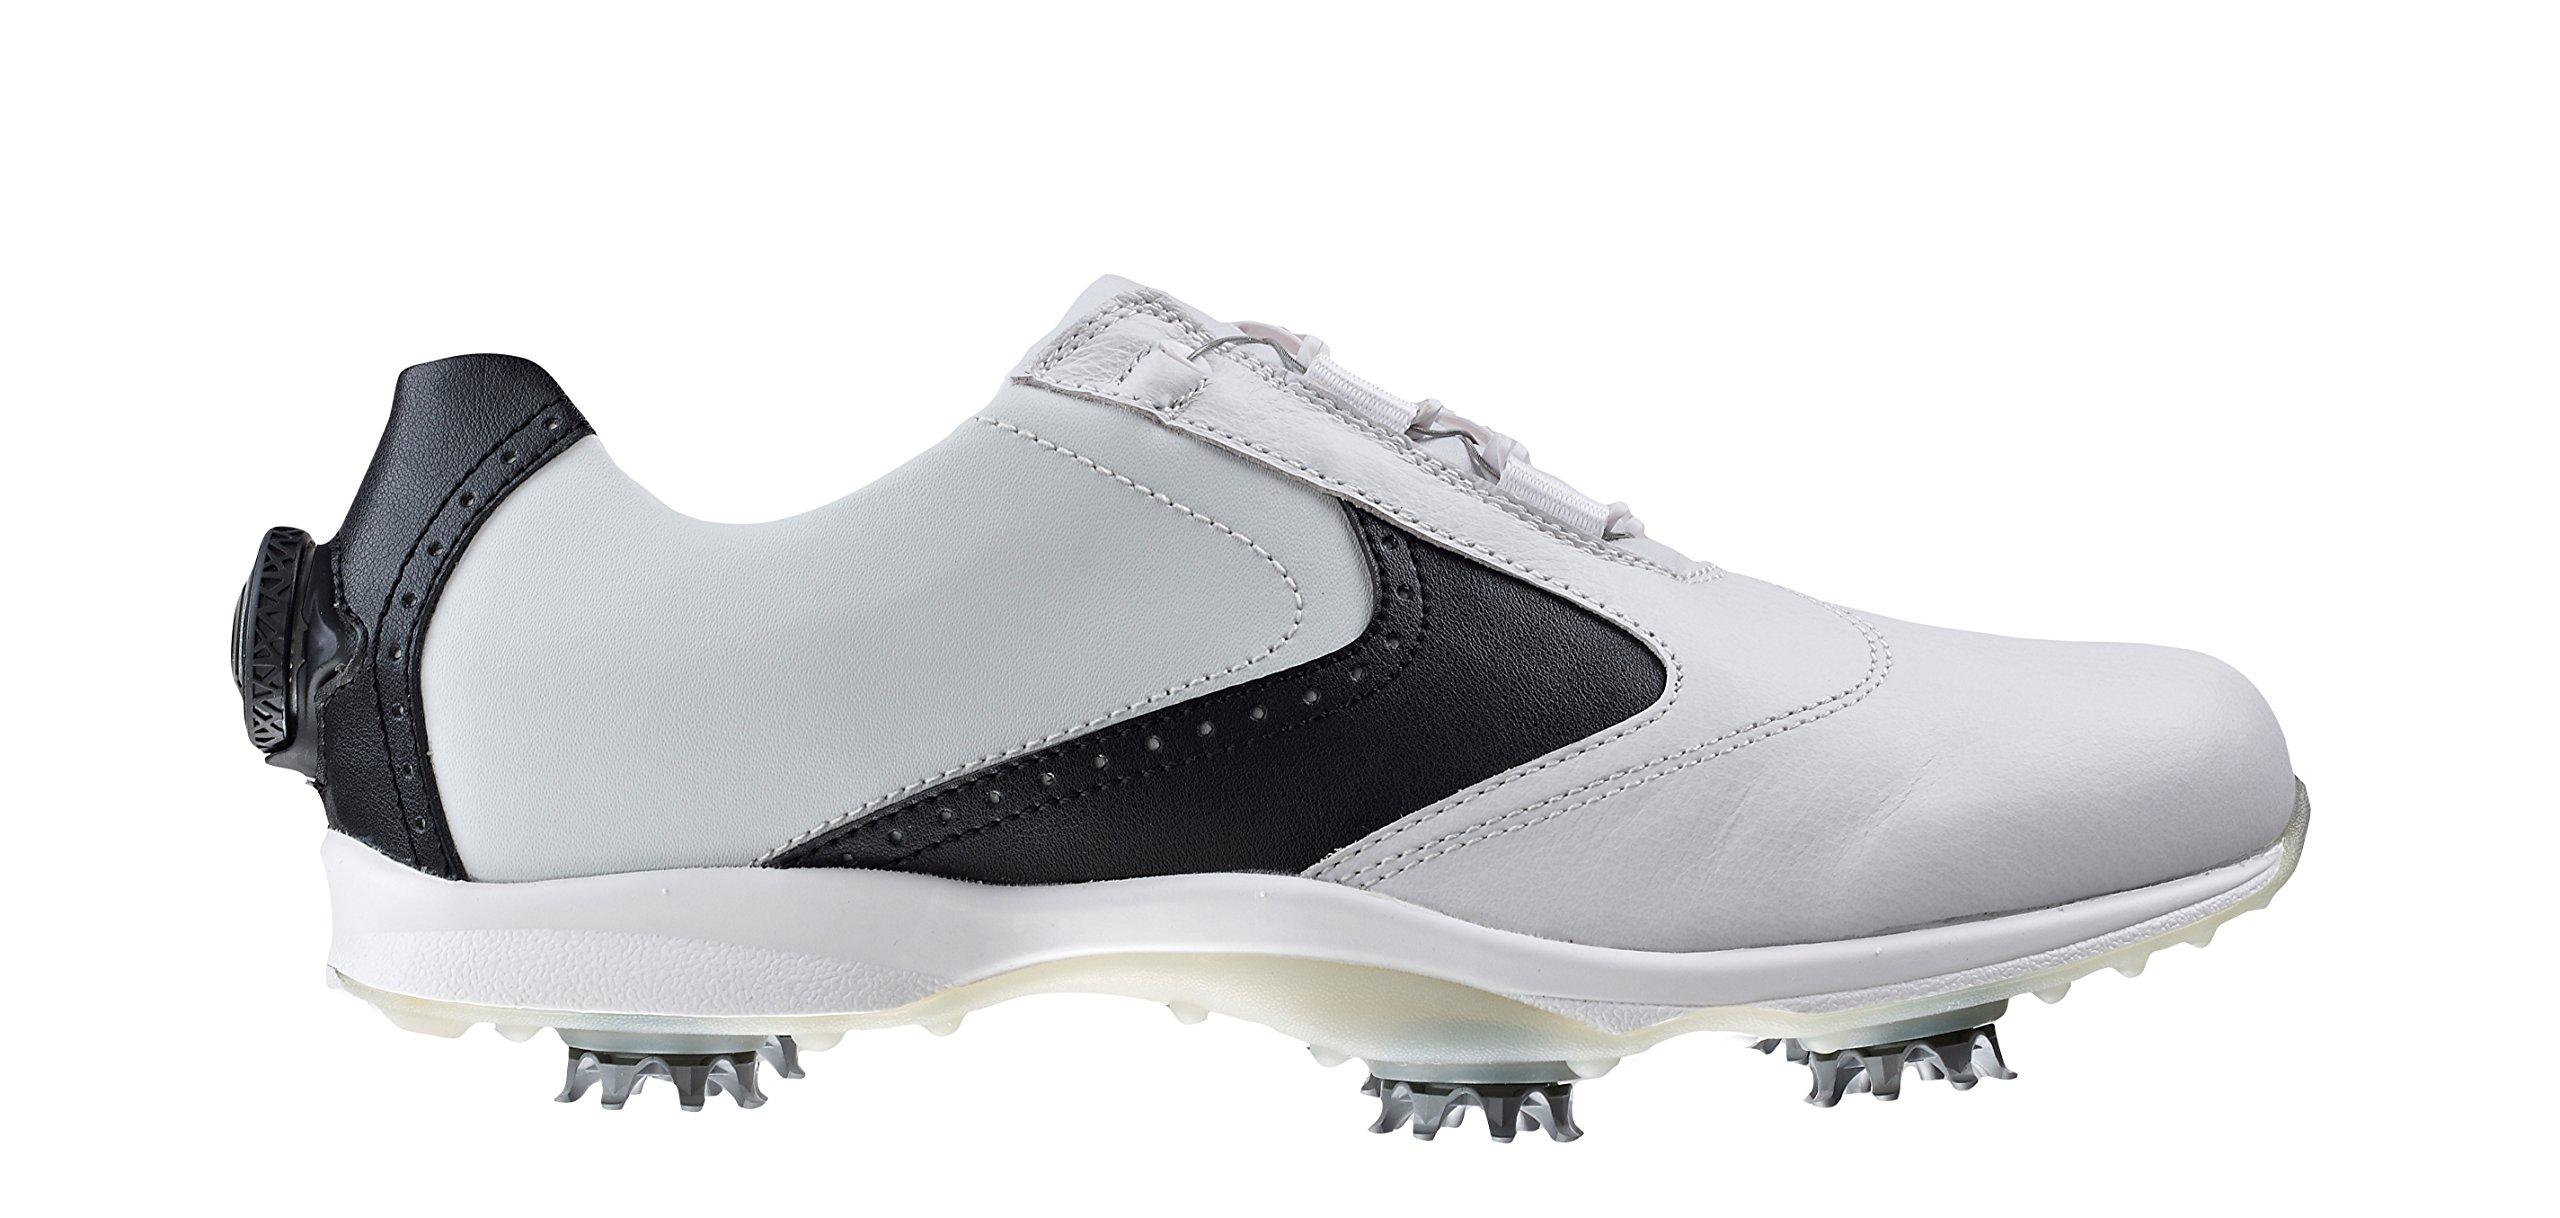 FootJoy Women's Golf Shoes Embody Boa 9 M White/Black